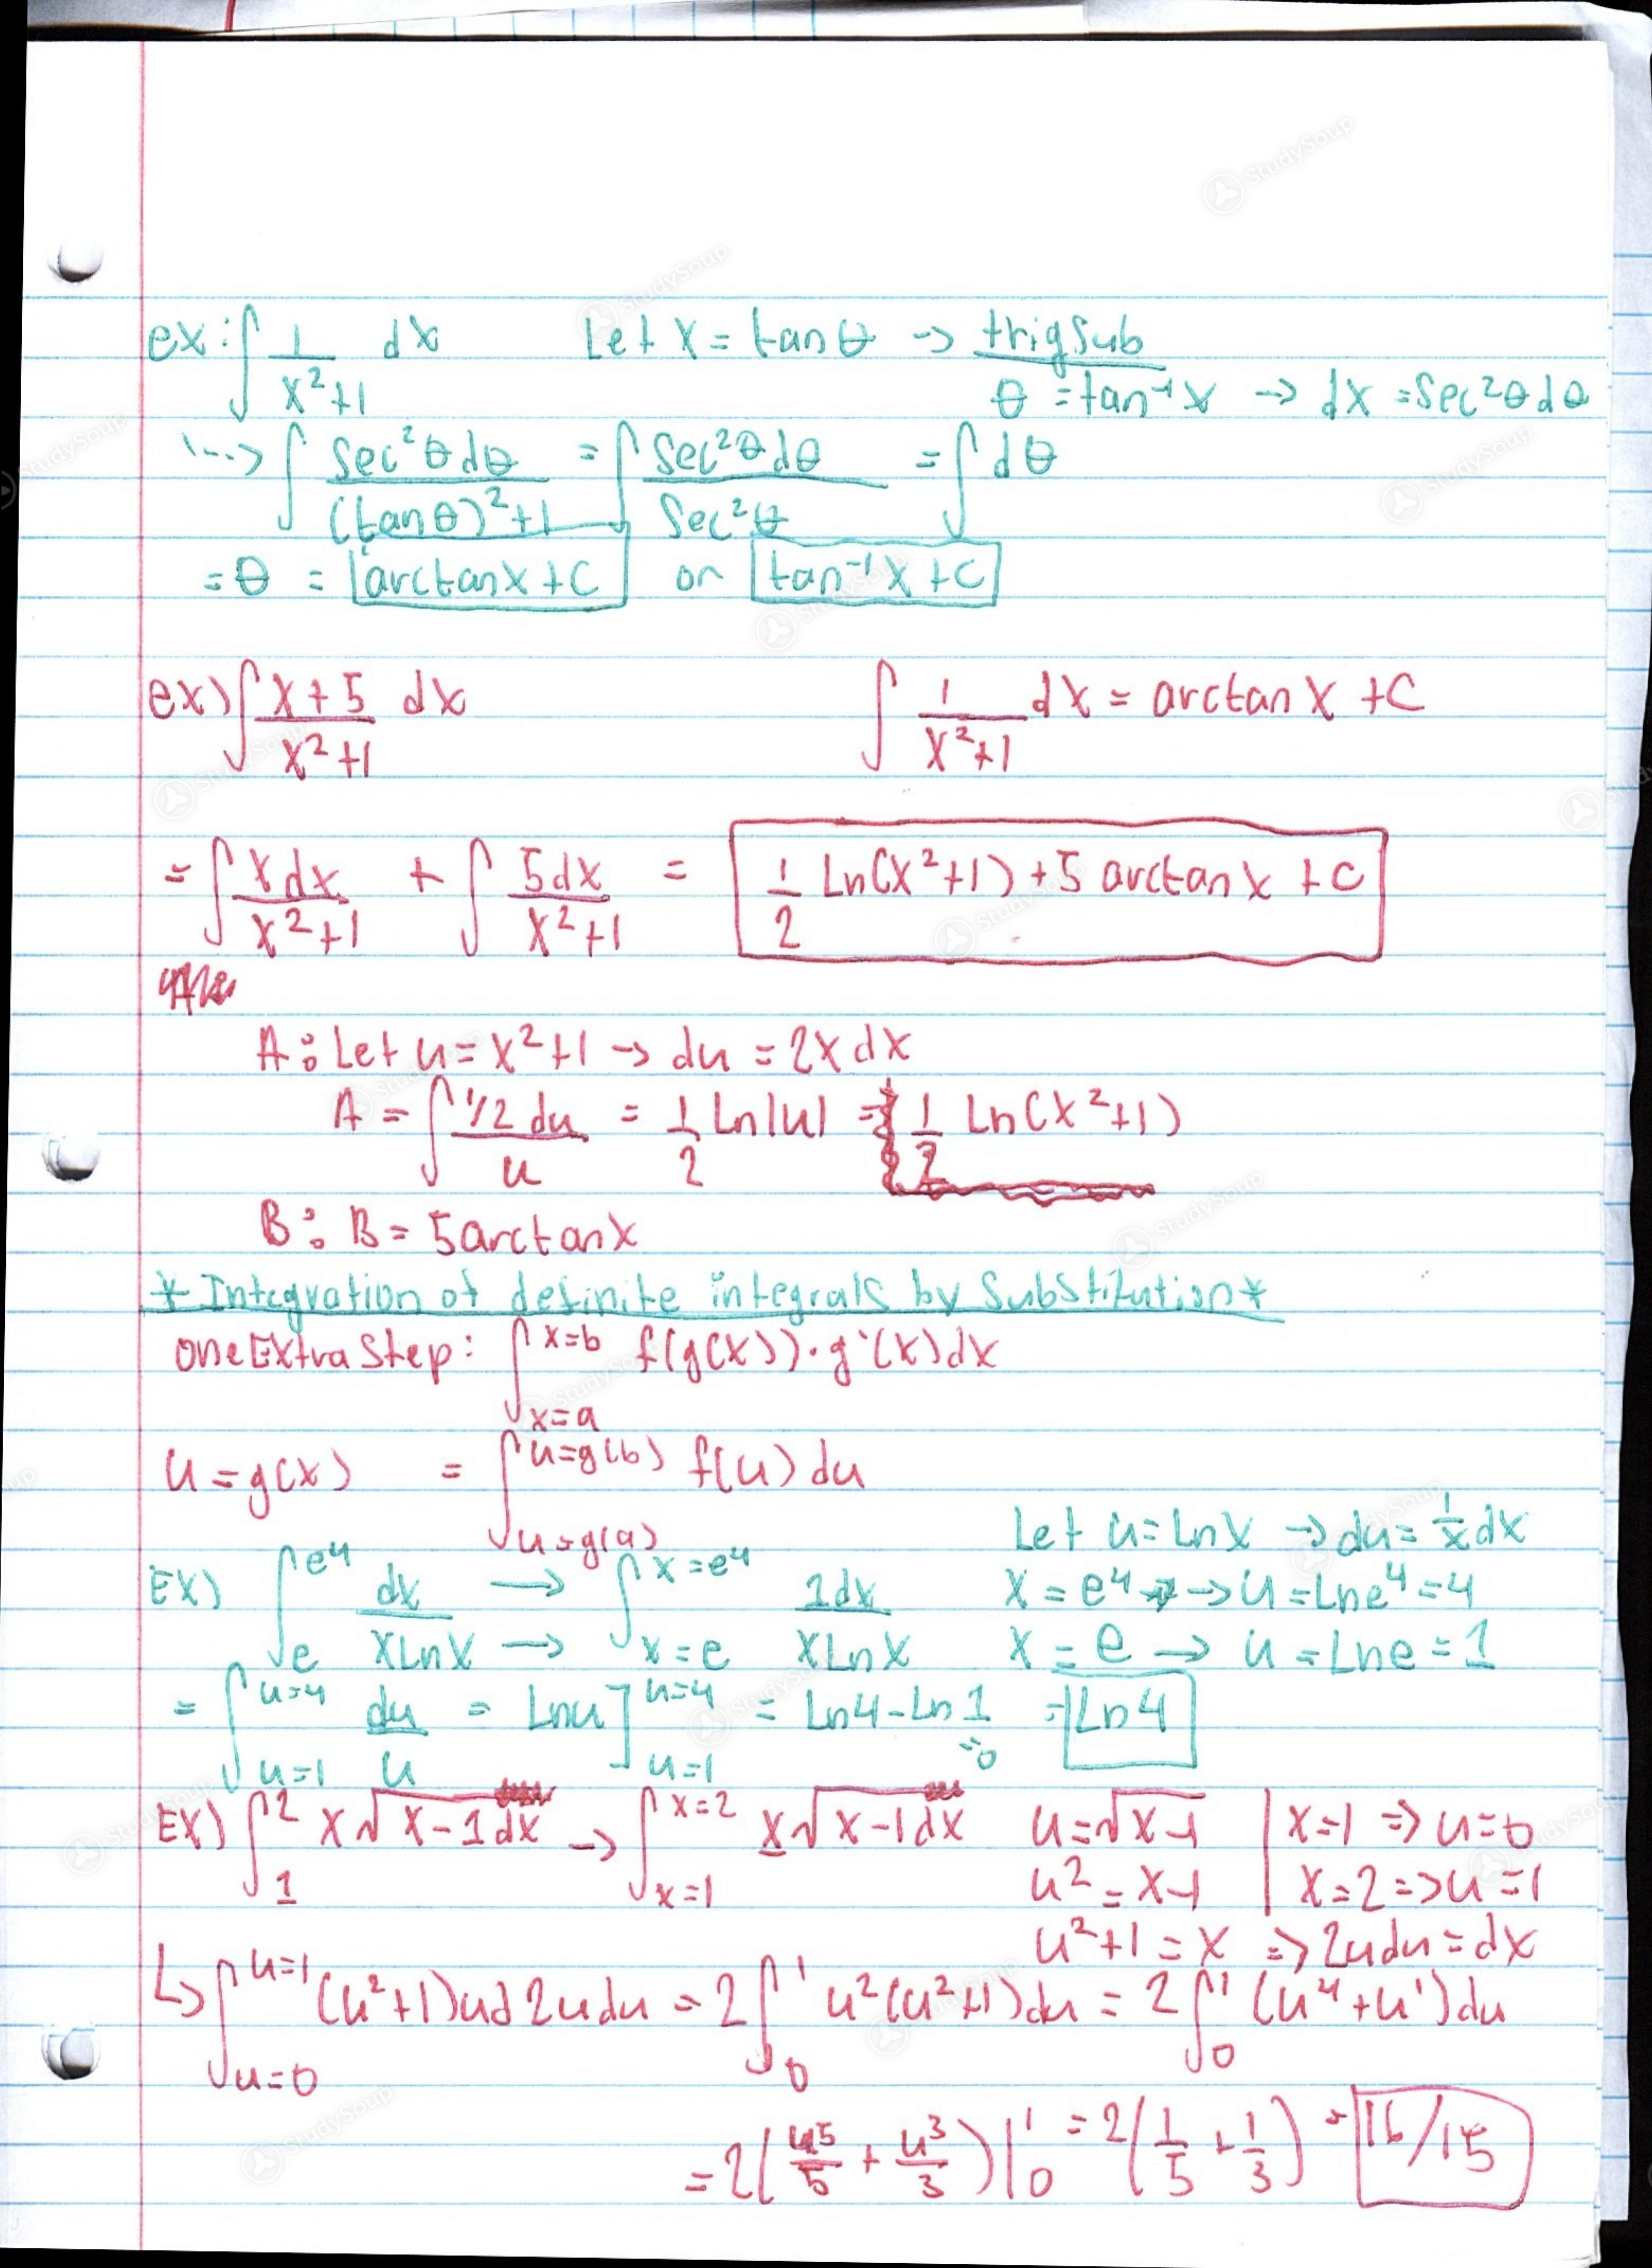 uic math 181 homework